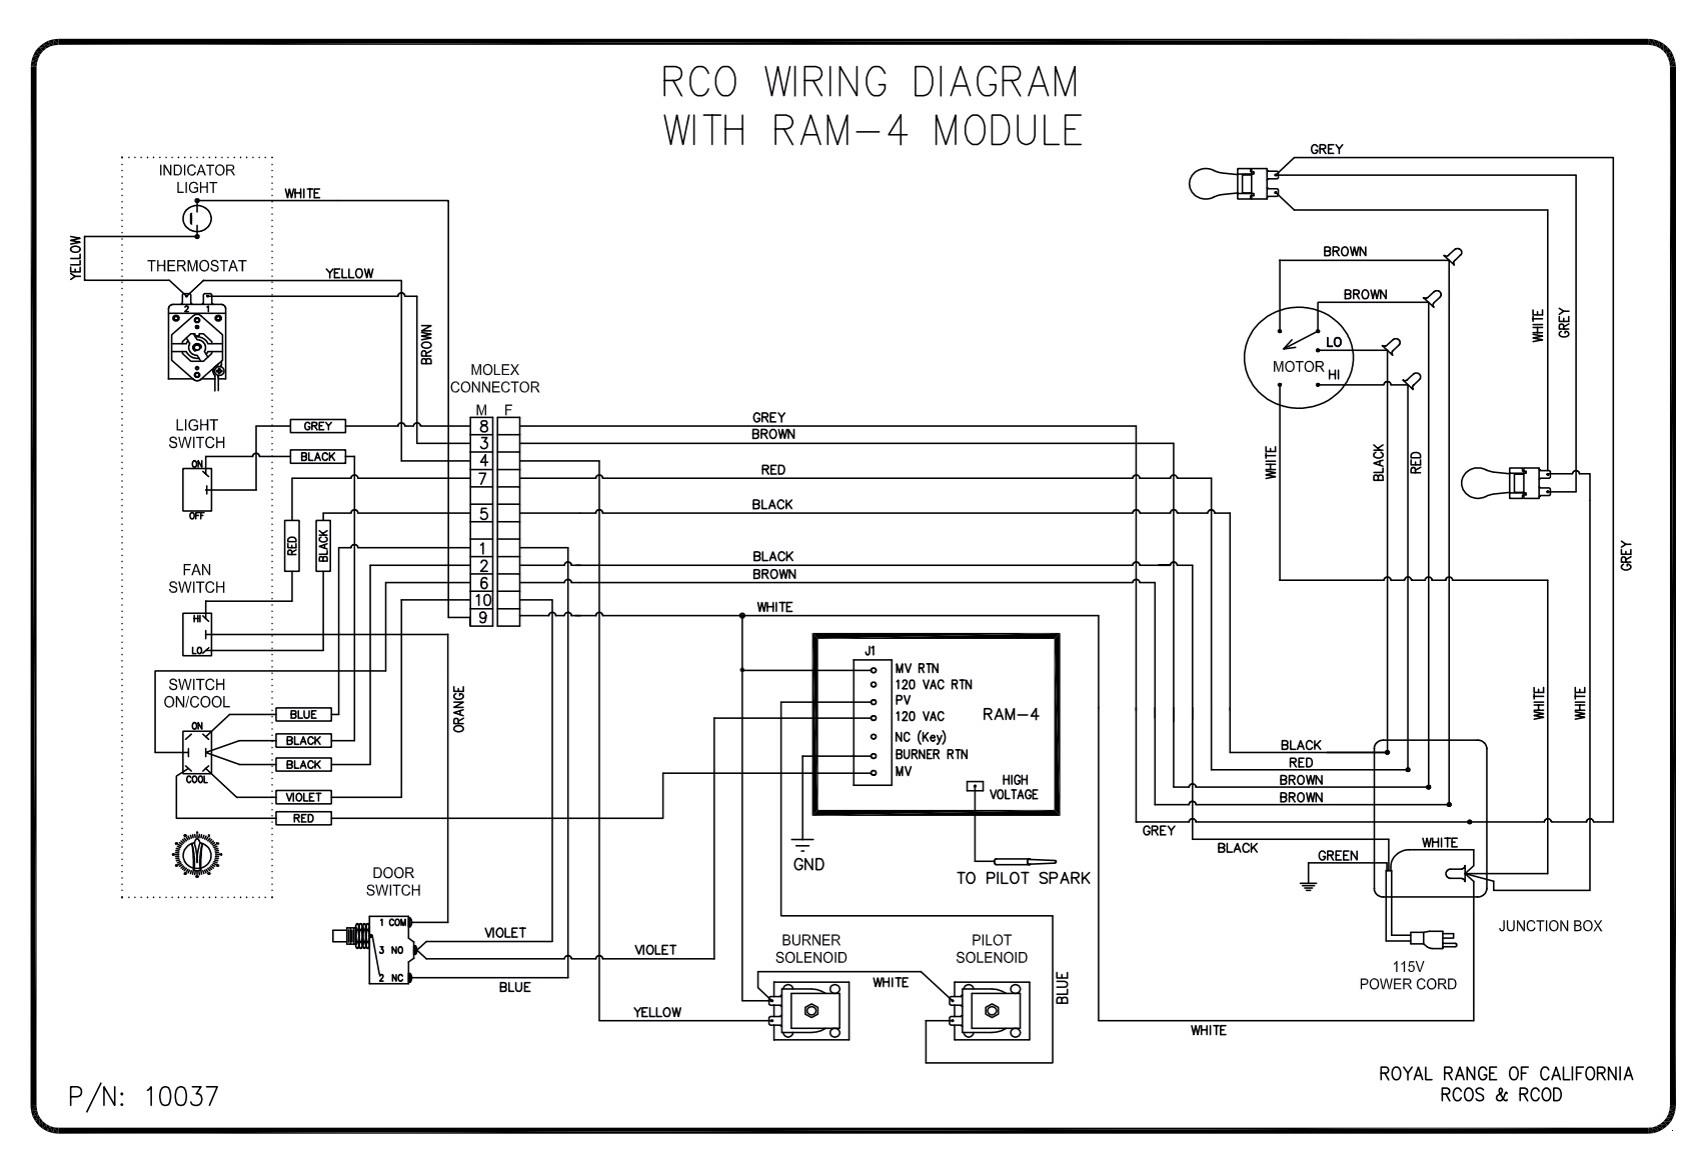 wiring diagrams royal range of california rh royalranges com